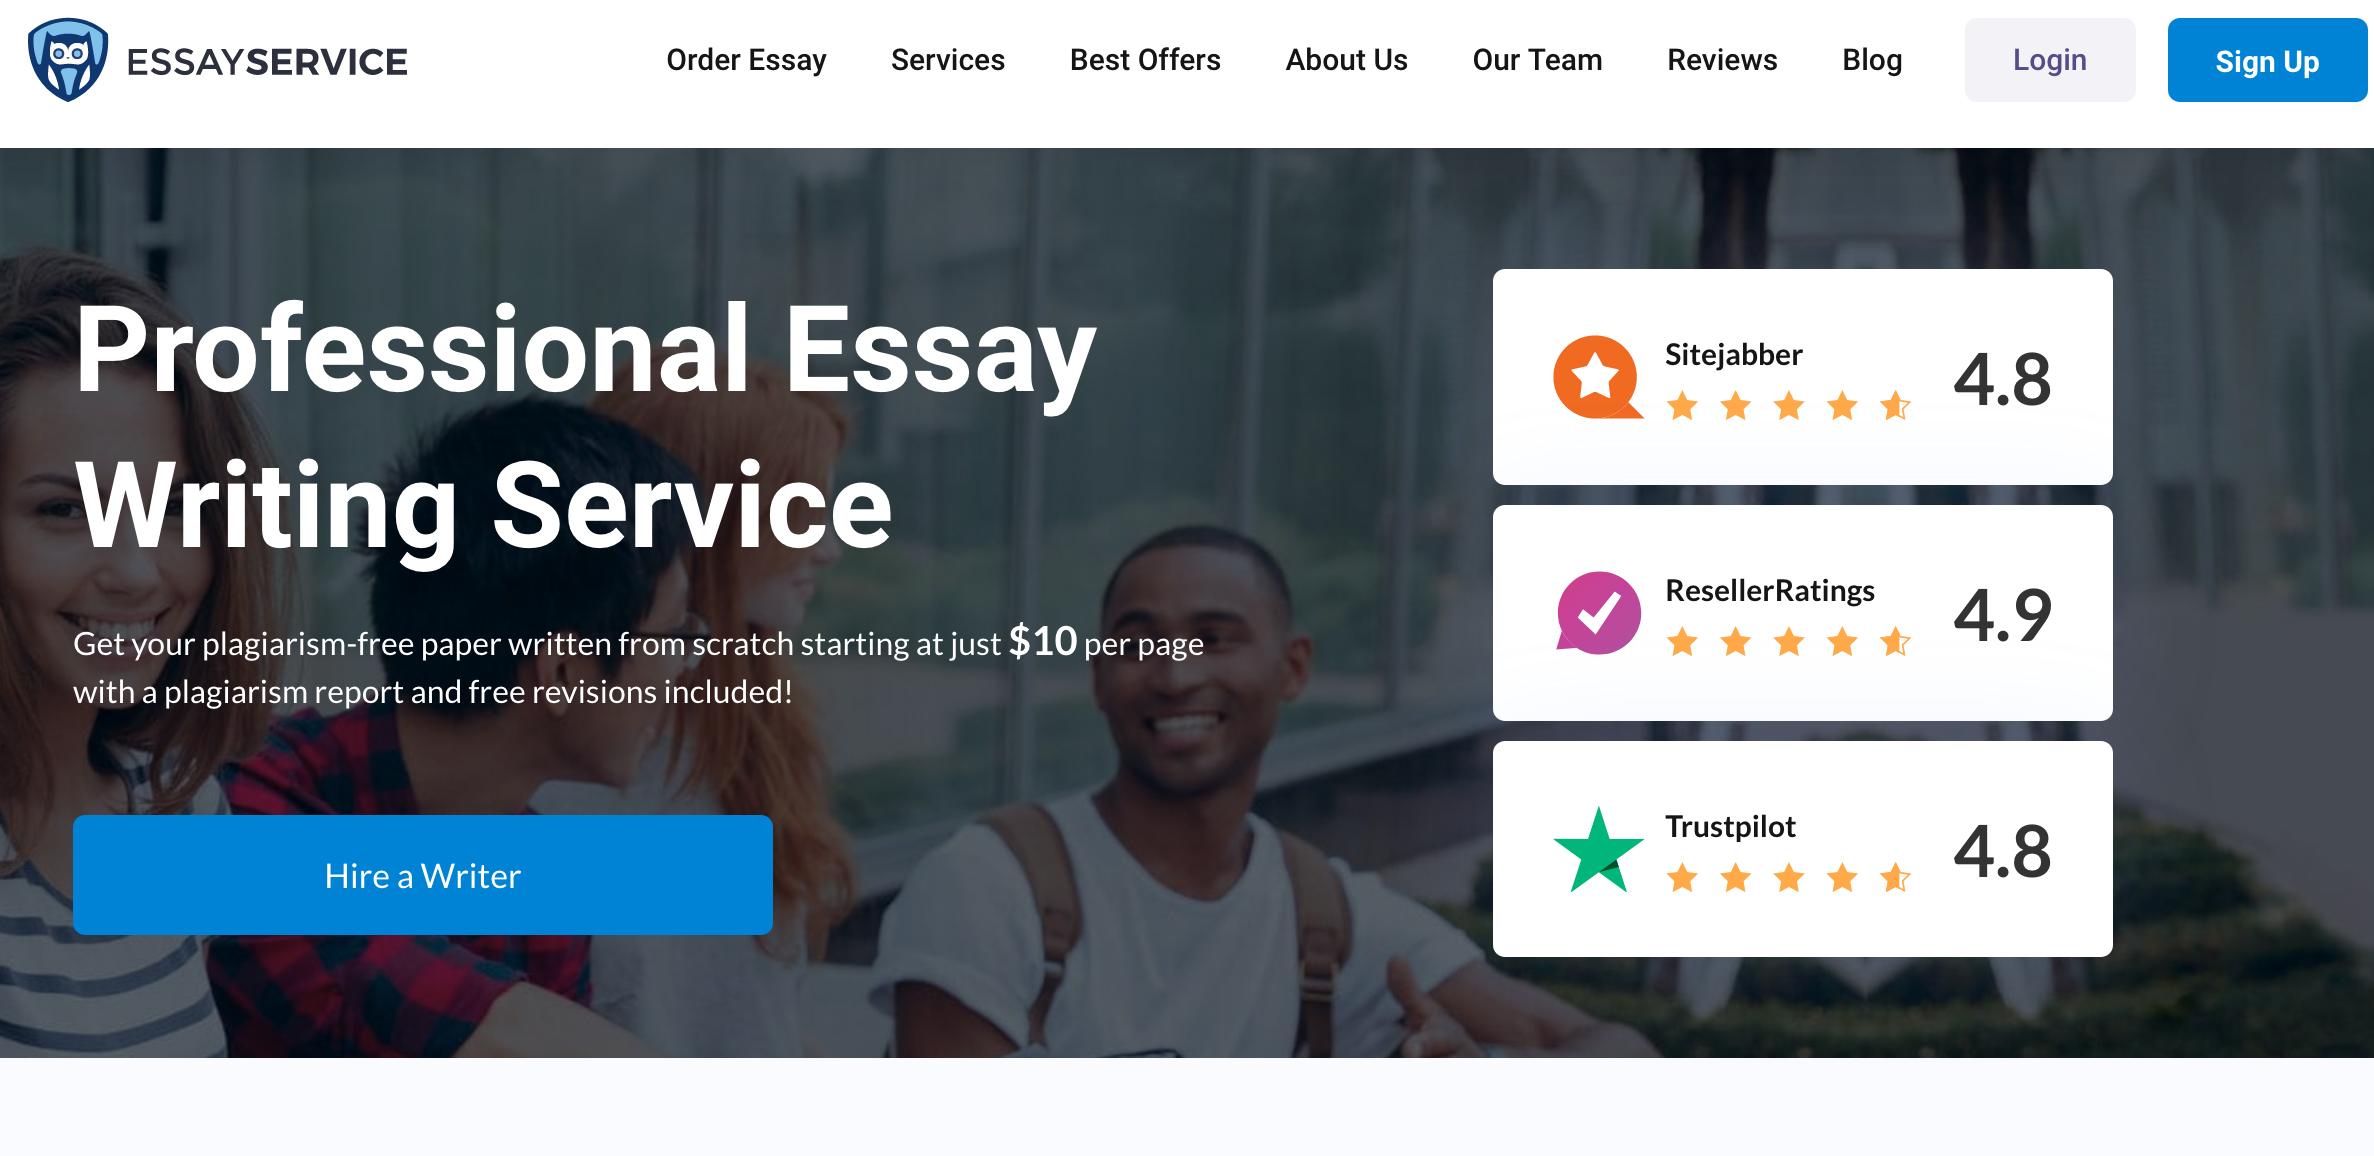 essayservice website